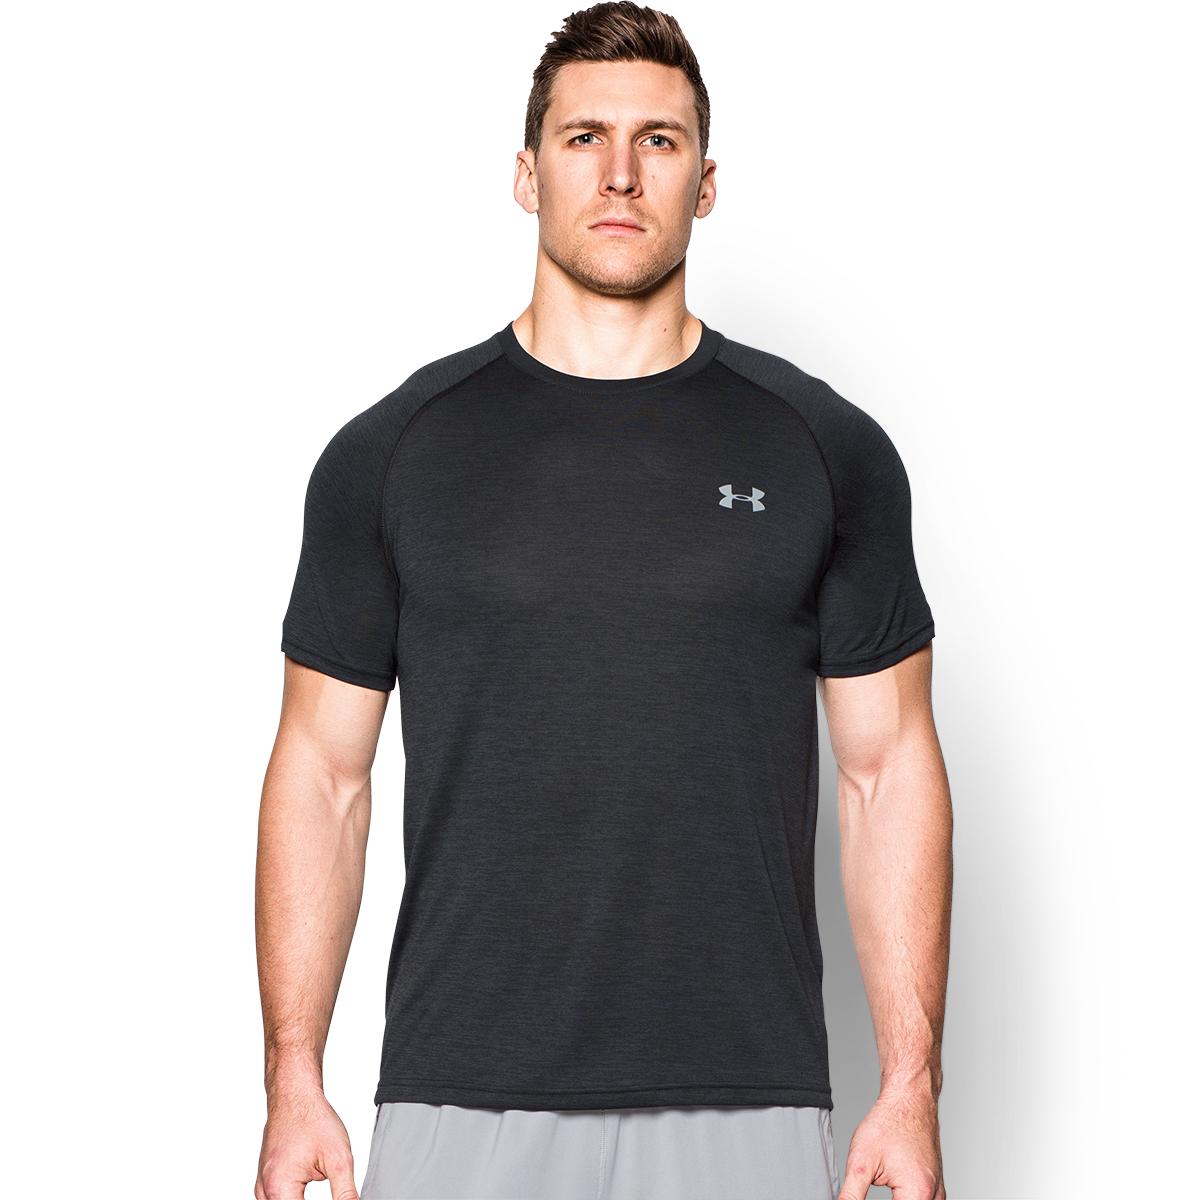 Under Armour Men's Short-Sleeve Tech Tee - Black, XXL